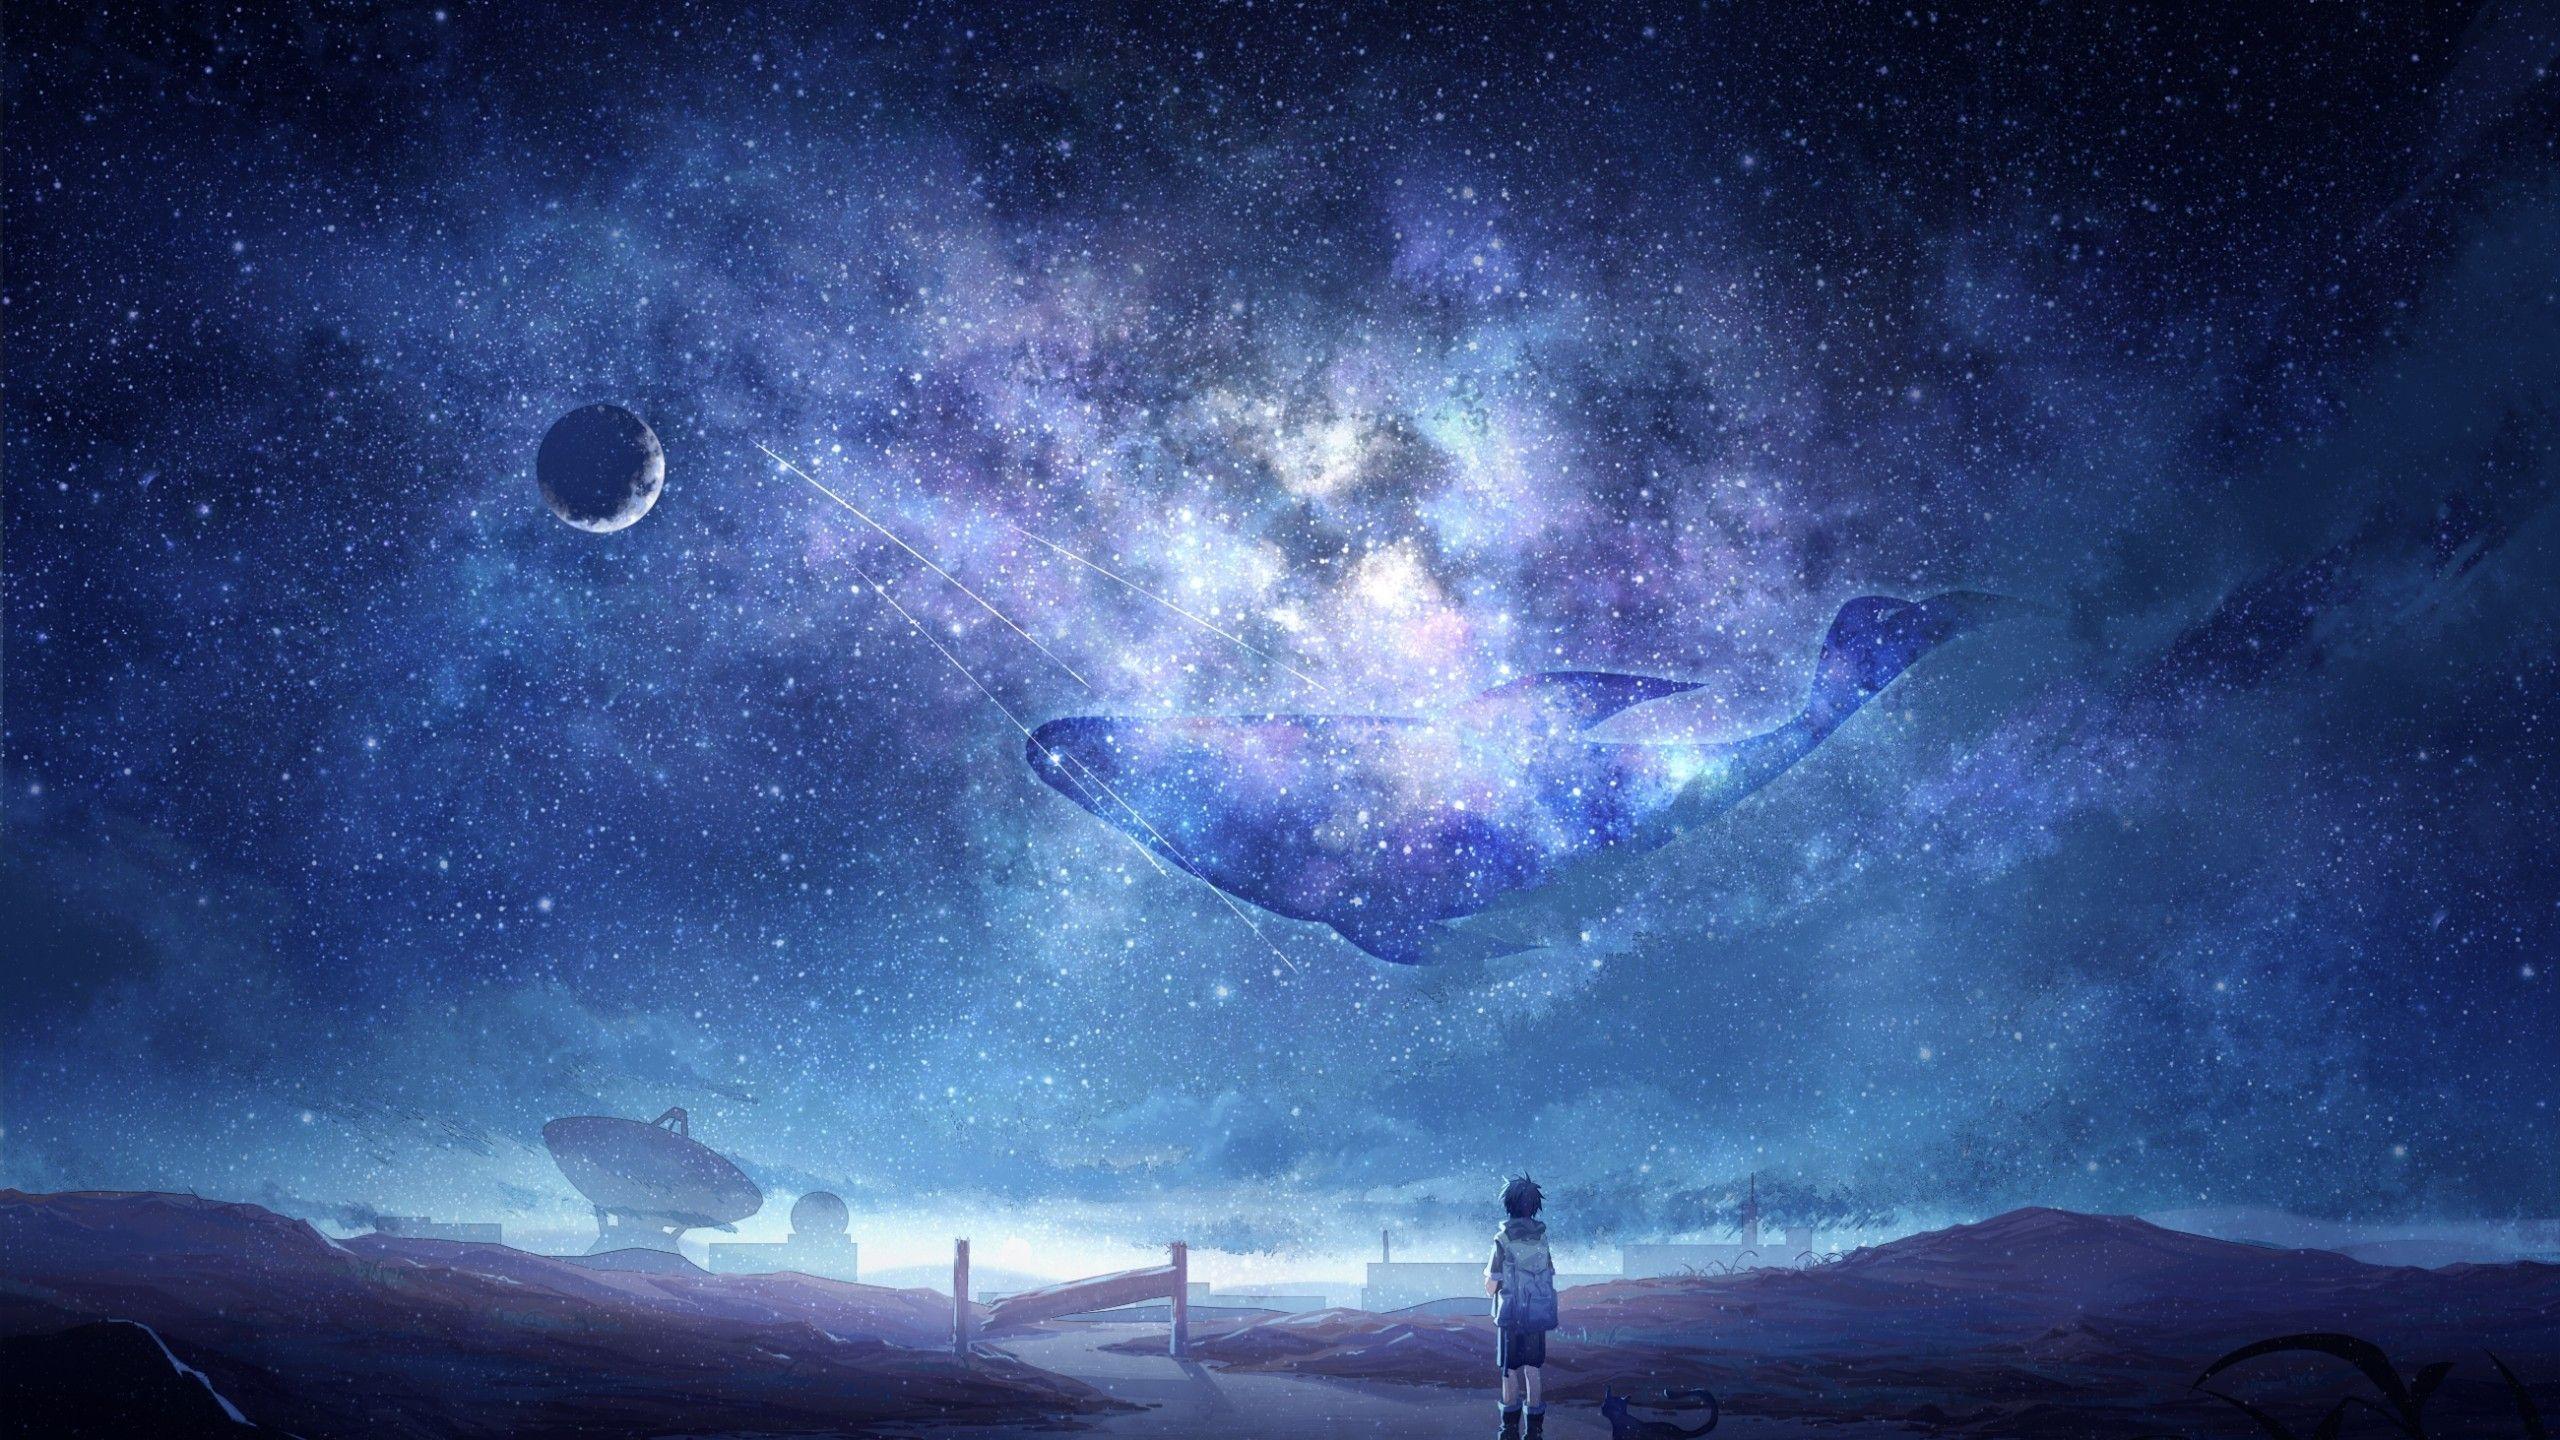 Anime Galaxy Wallpapers On Wallpaperdog